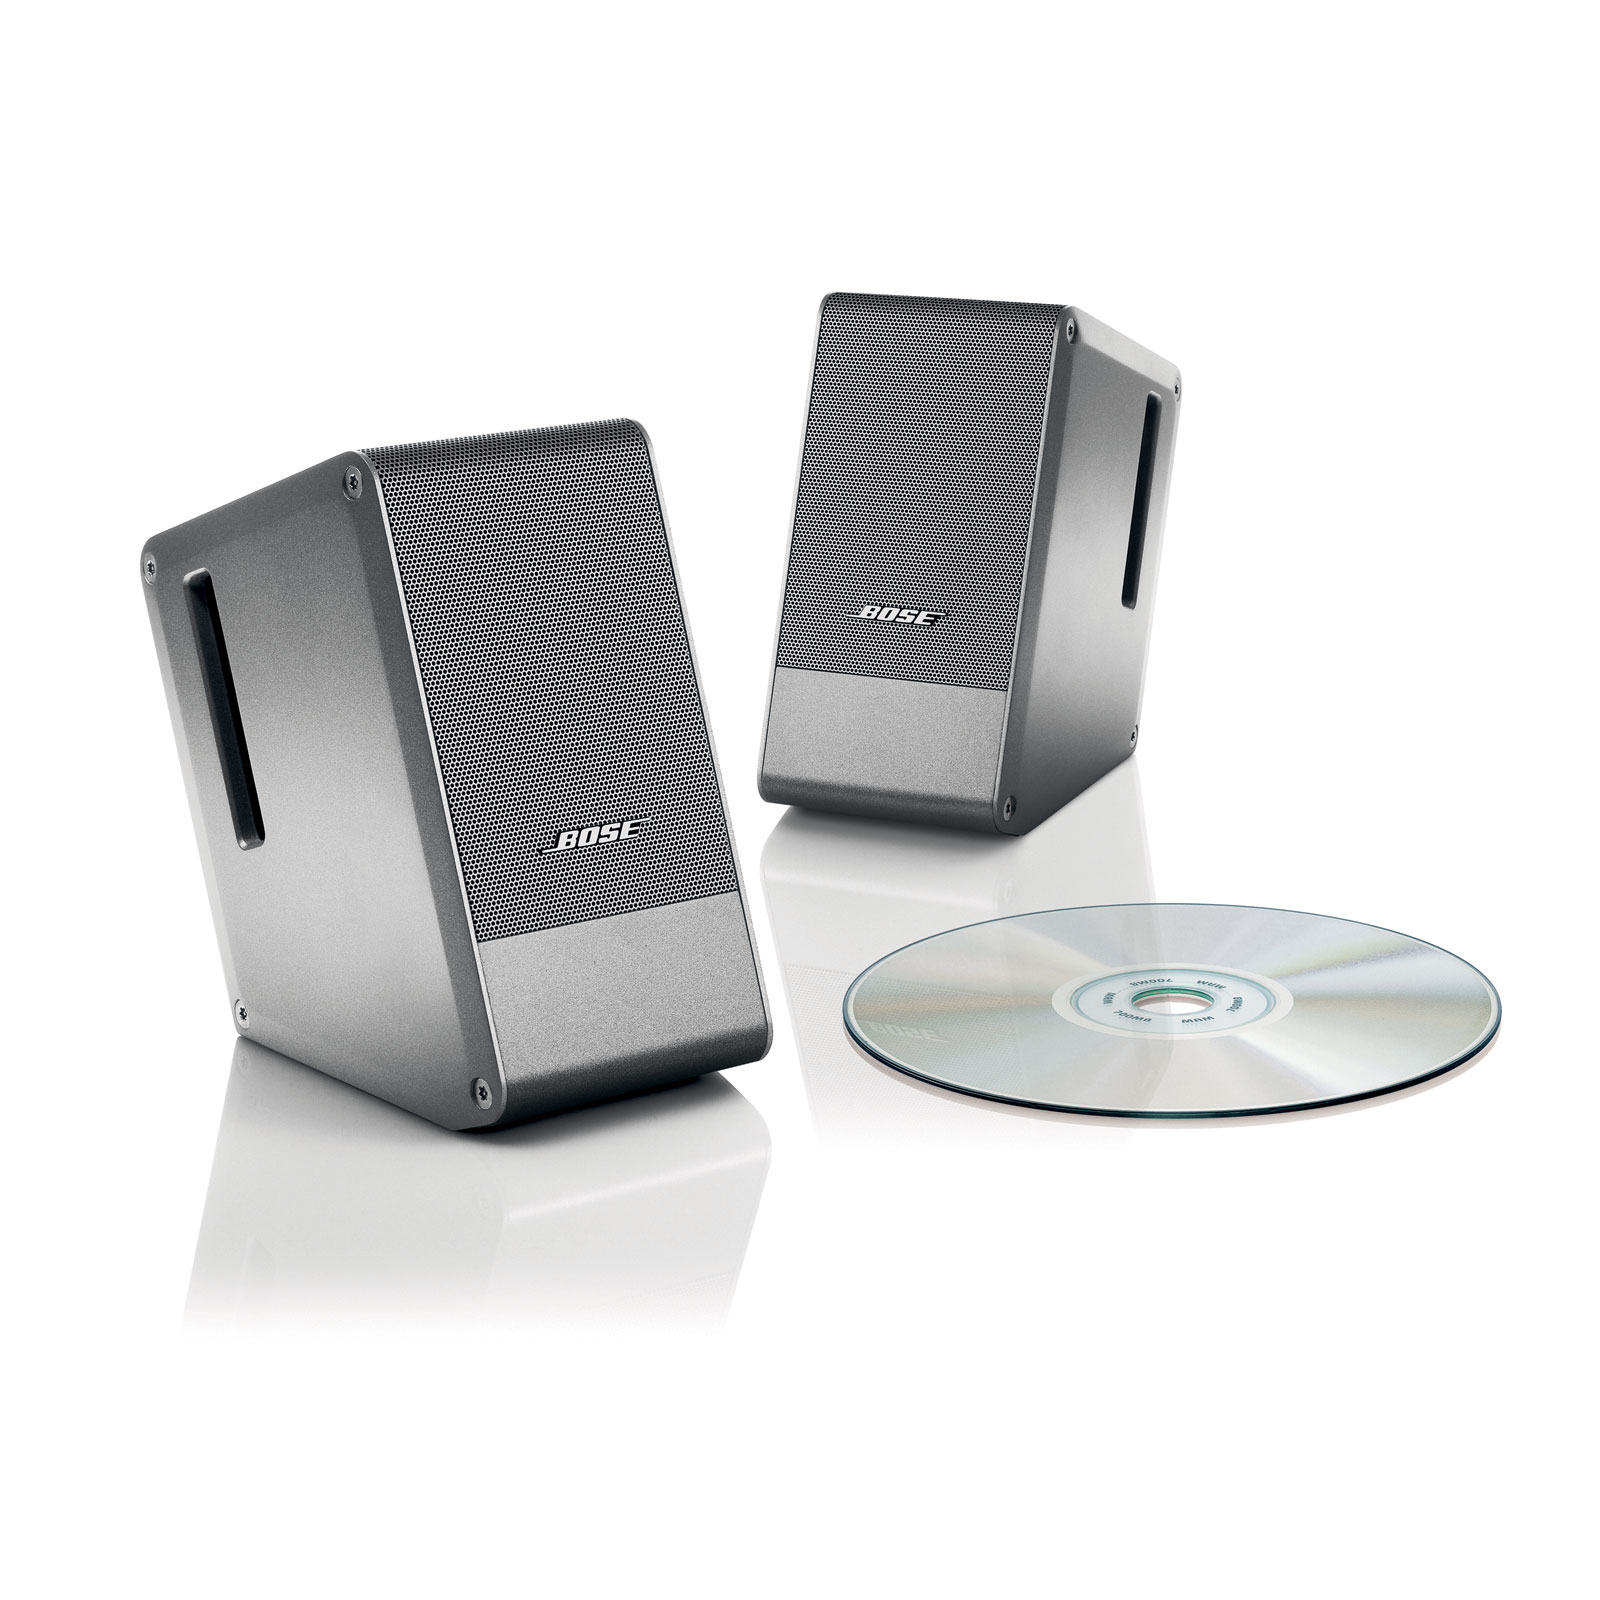 Radio Bose Ebay